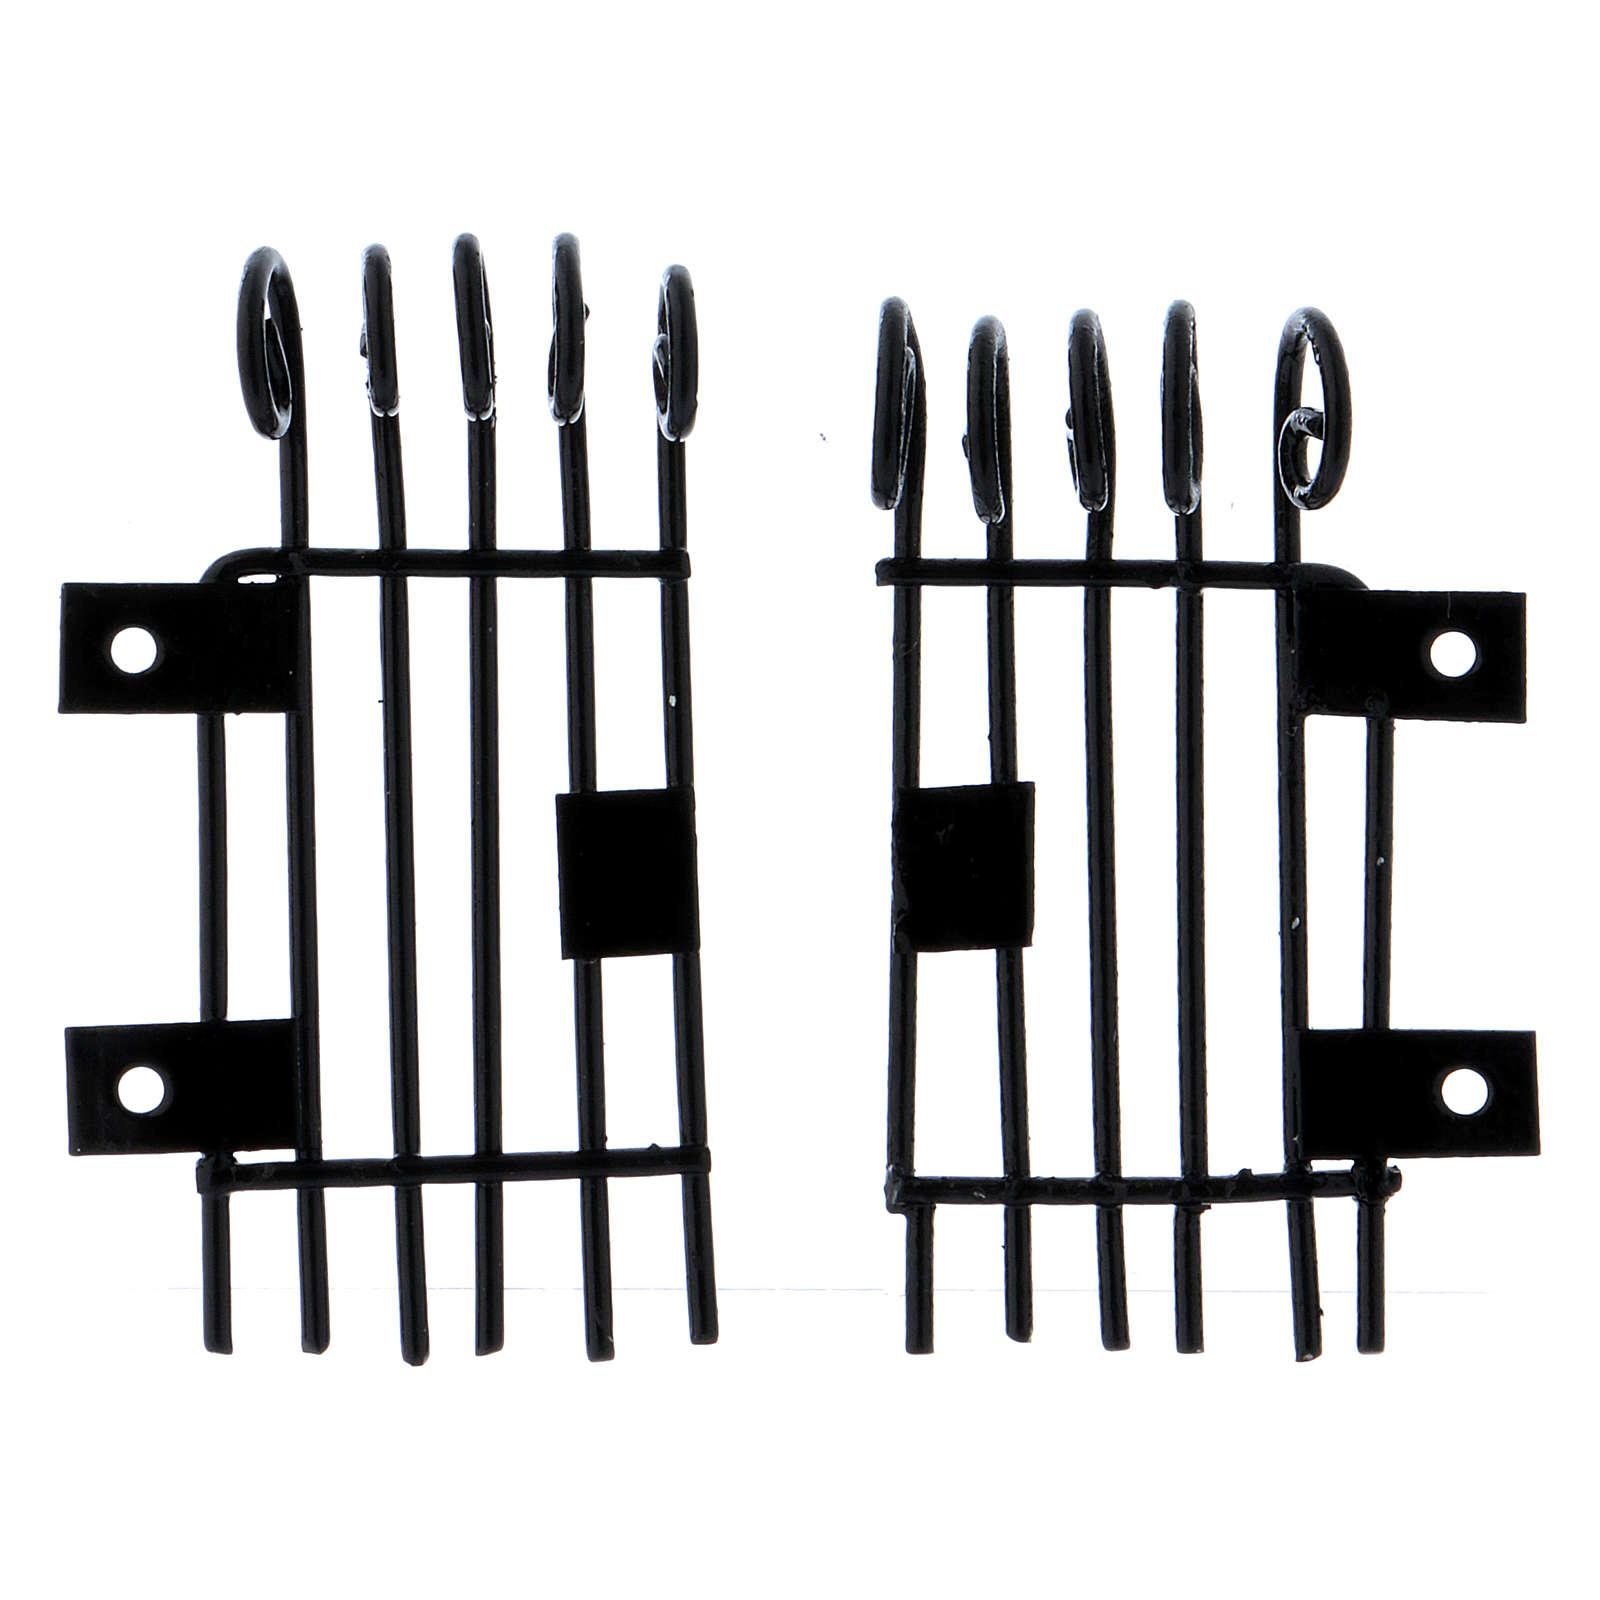 Barandillas que se pueden abrir rectangulares h 3,7 largas 2 cm 4